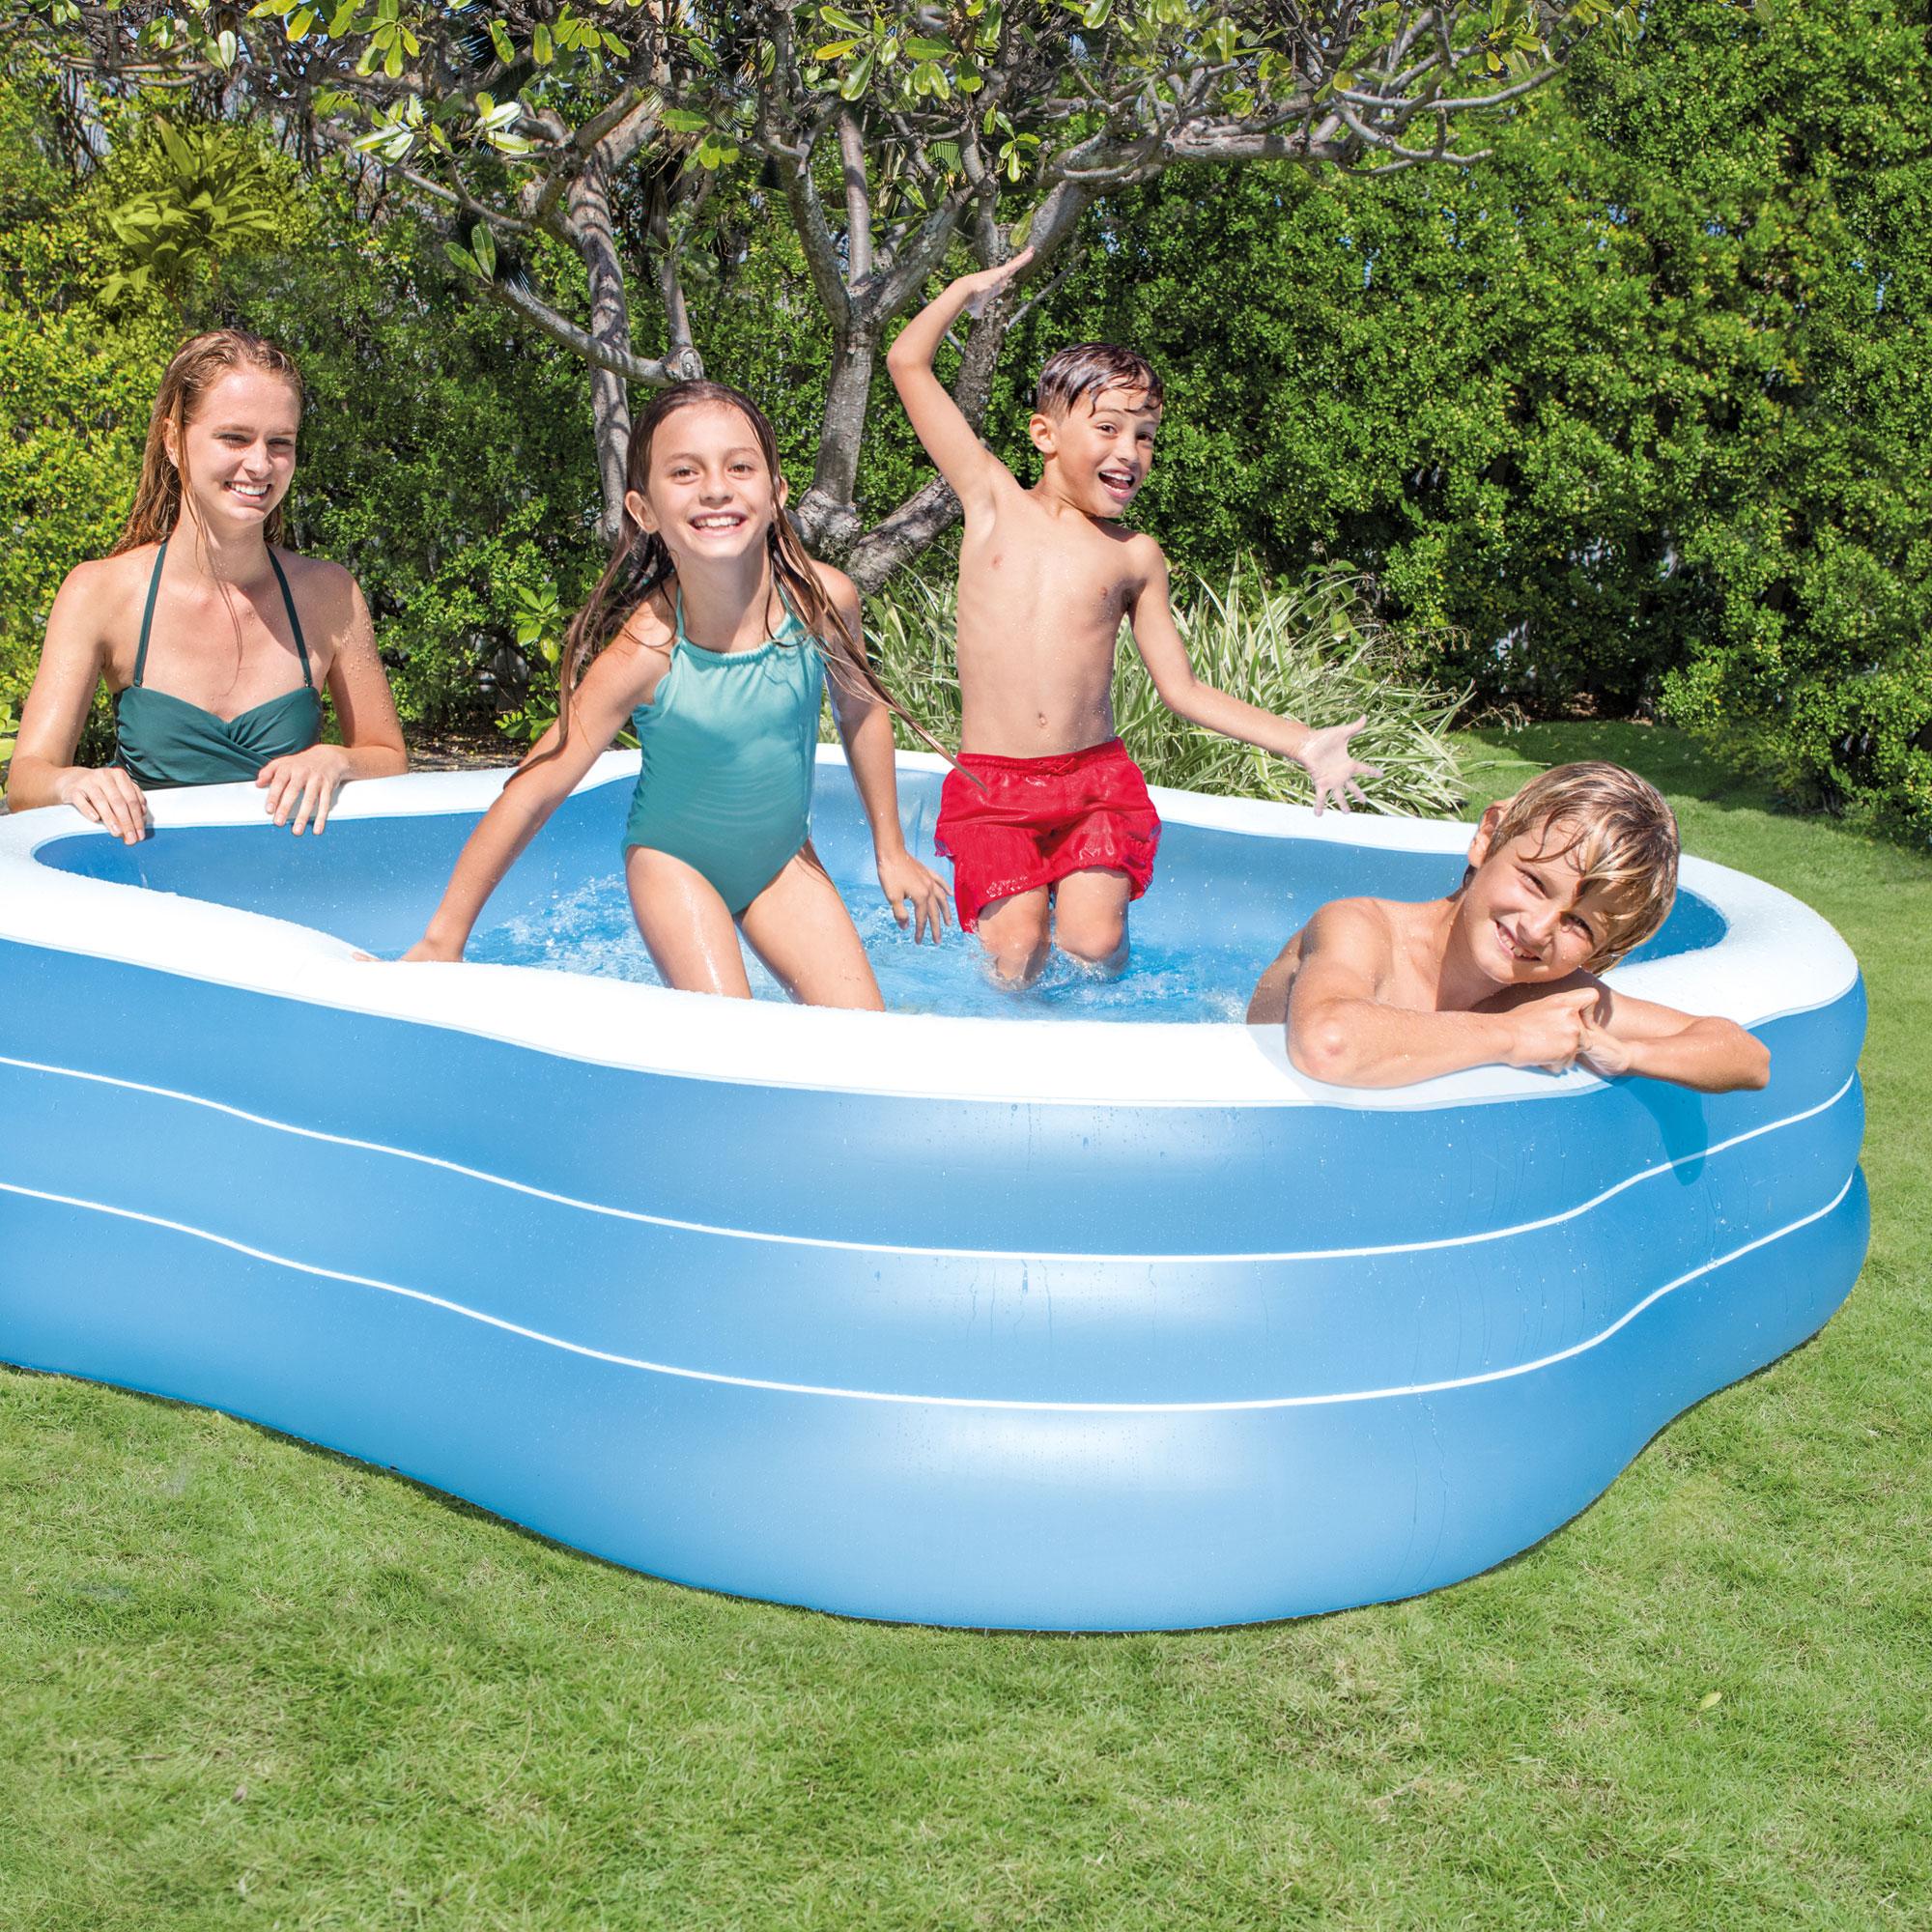 Intex swim center backyard inflatable play swimming pool for family and kids ebay - Intex swim center family pool ...